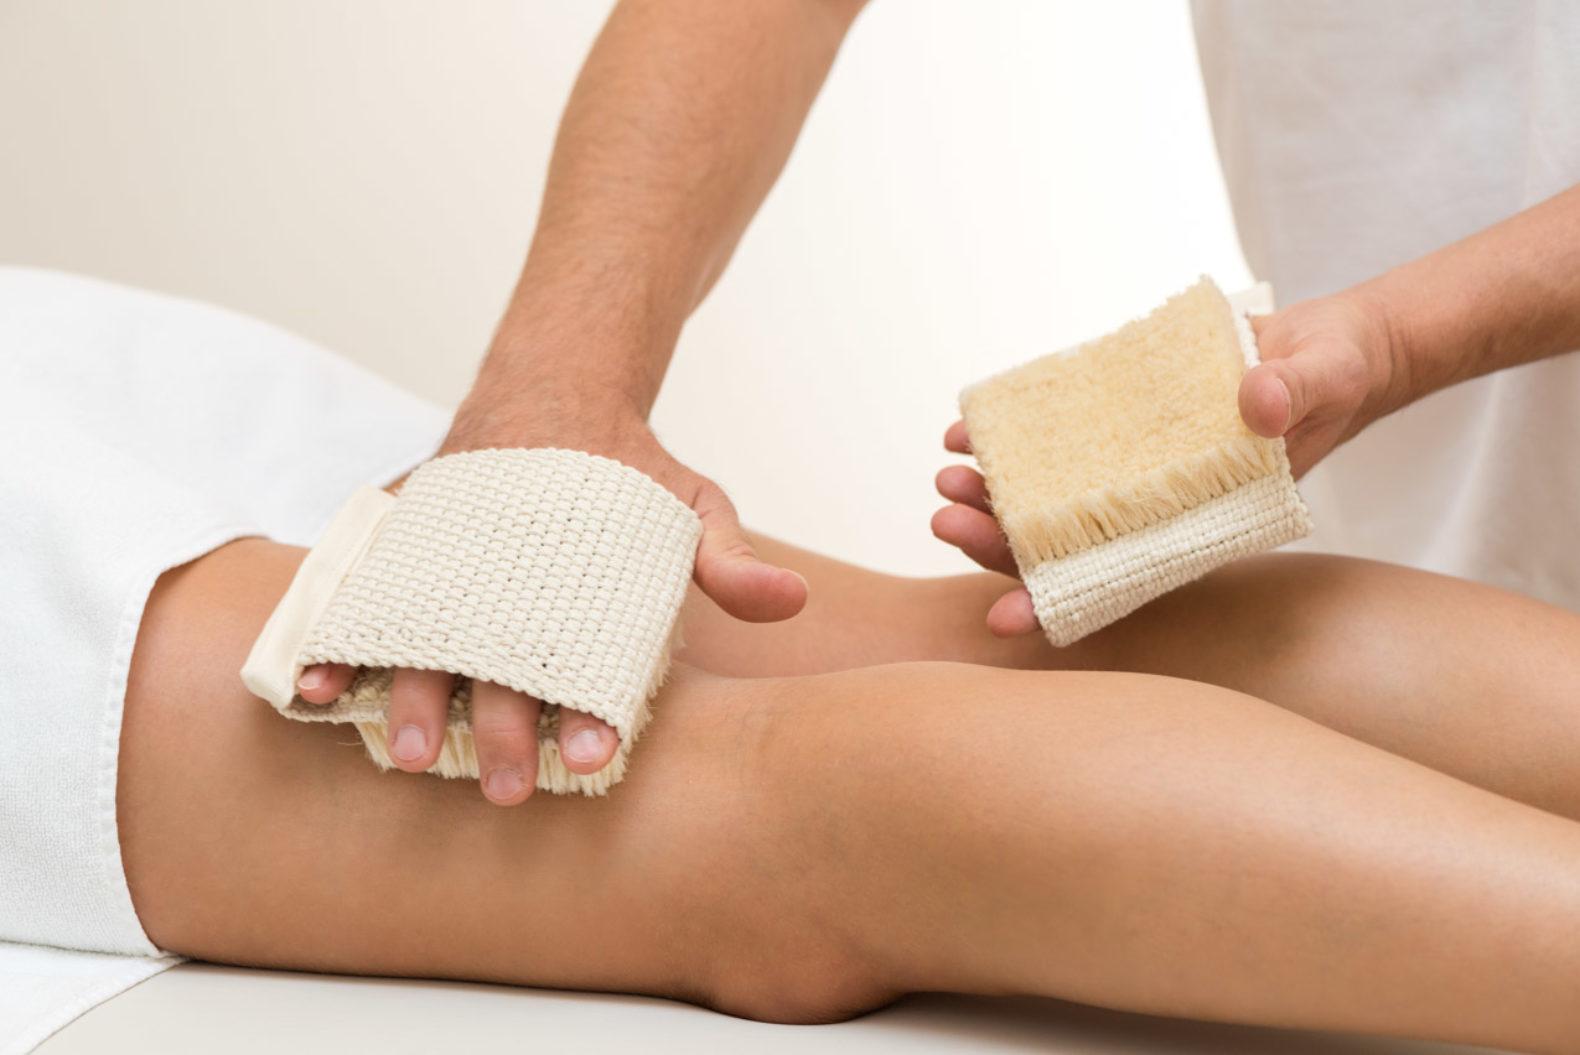 scrub-spa-treatment-cleansing-buchinger-wilhelmi-bodensee-lake-constance-germany